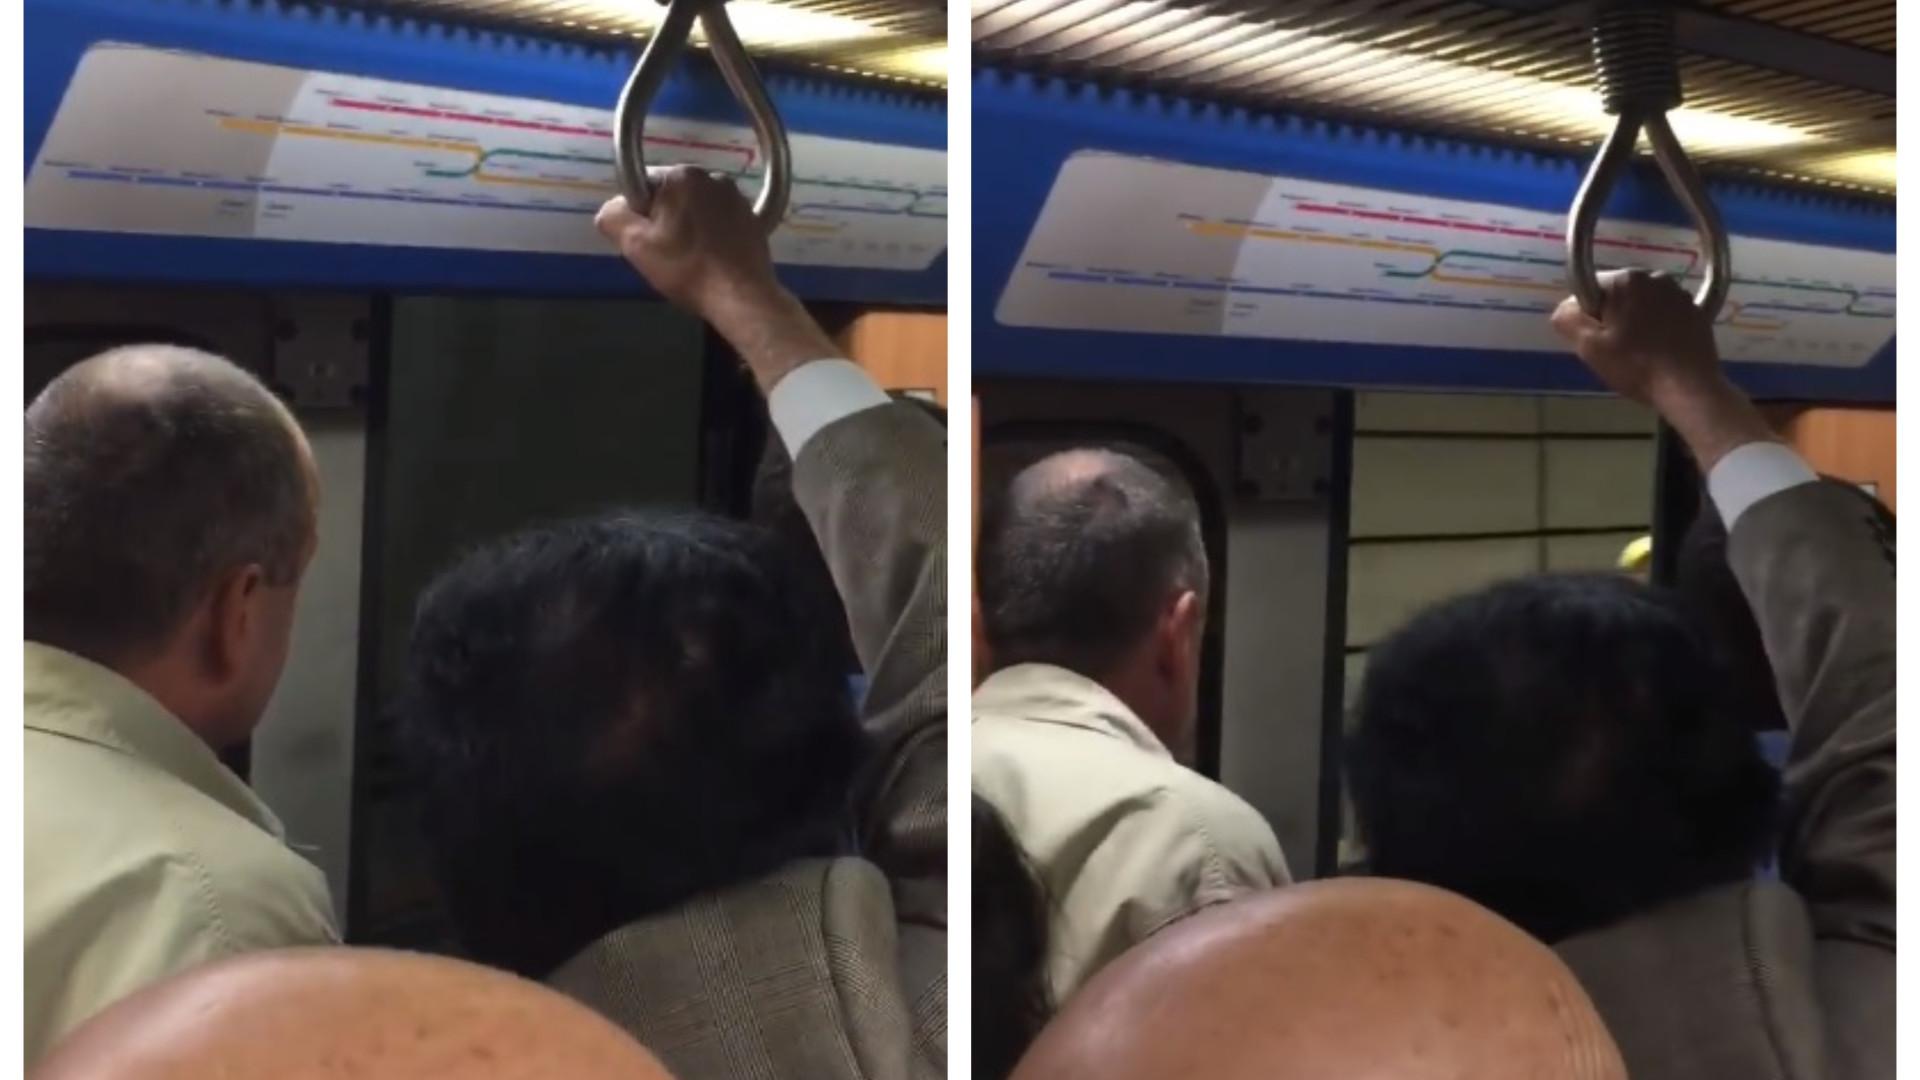 Imagens mostram o Metro de Lisboa a circular cheio e de porta aberta